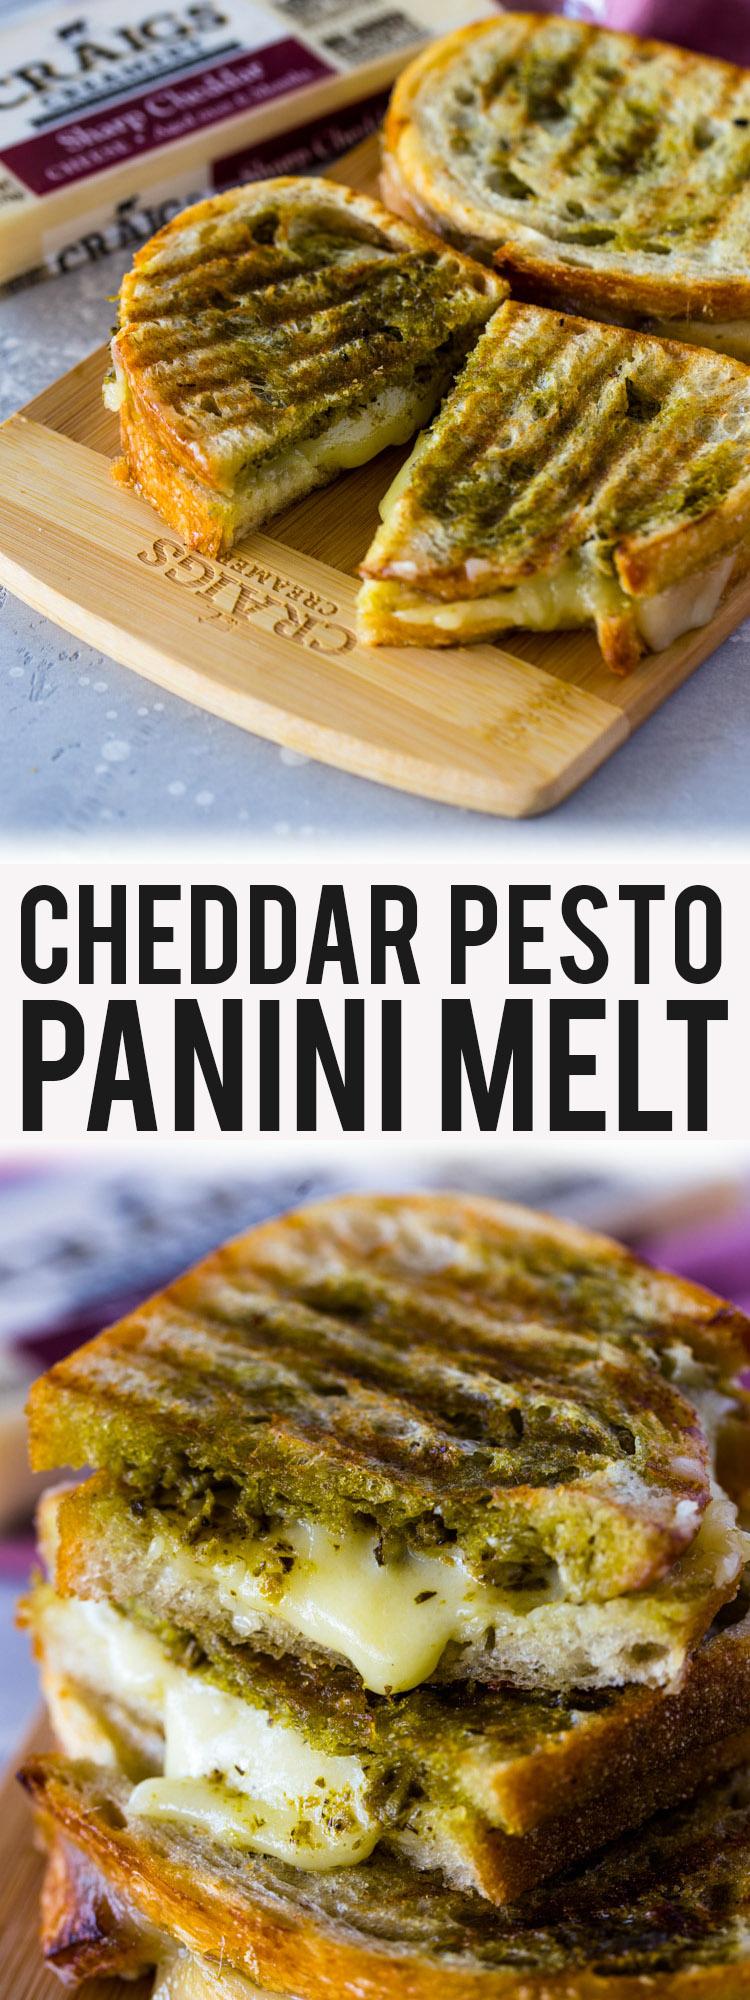 Cheddar Pesto Panini Melts